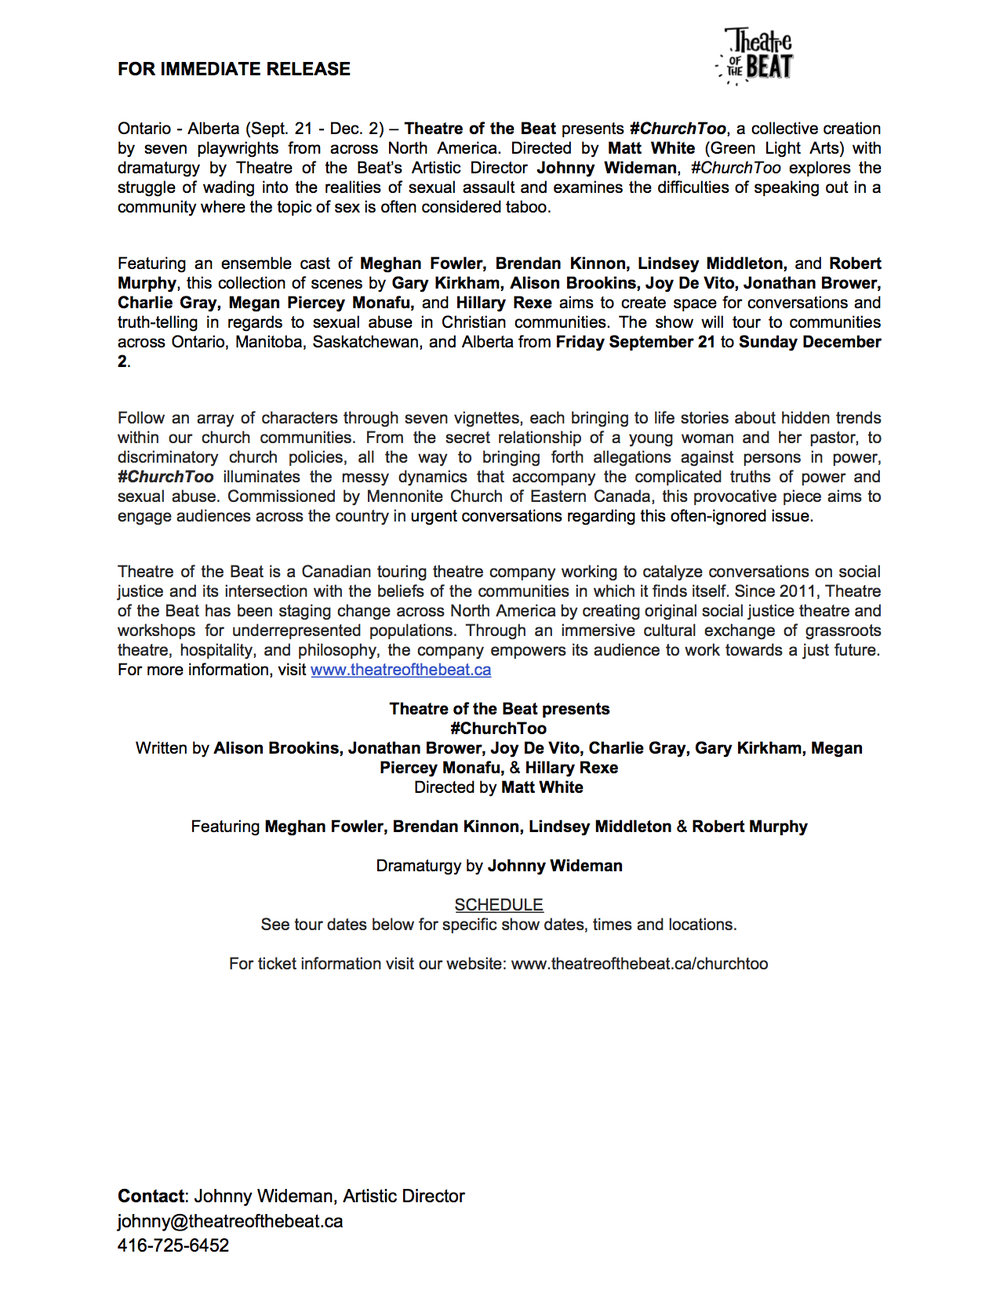 #ChurchToo Tour Press Release 2.0.jpg